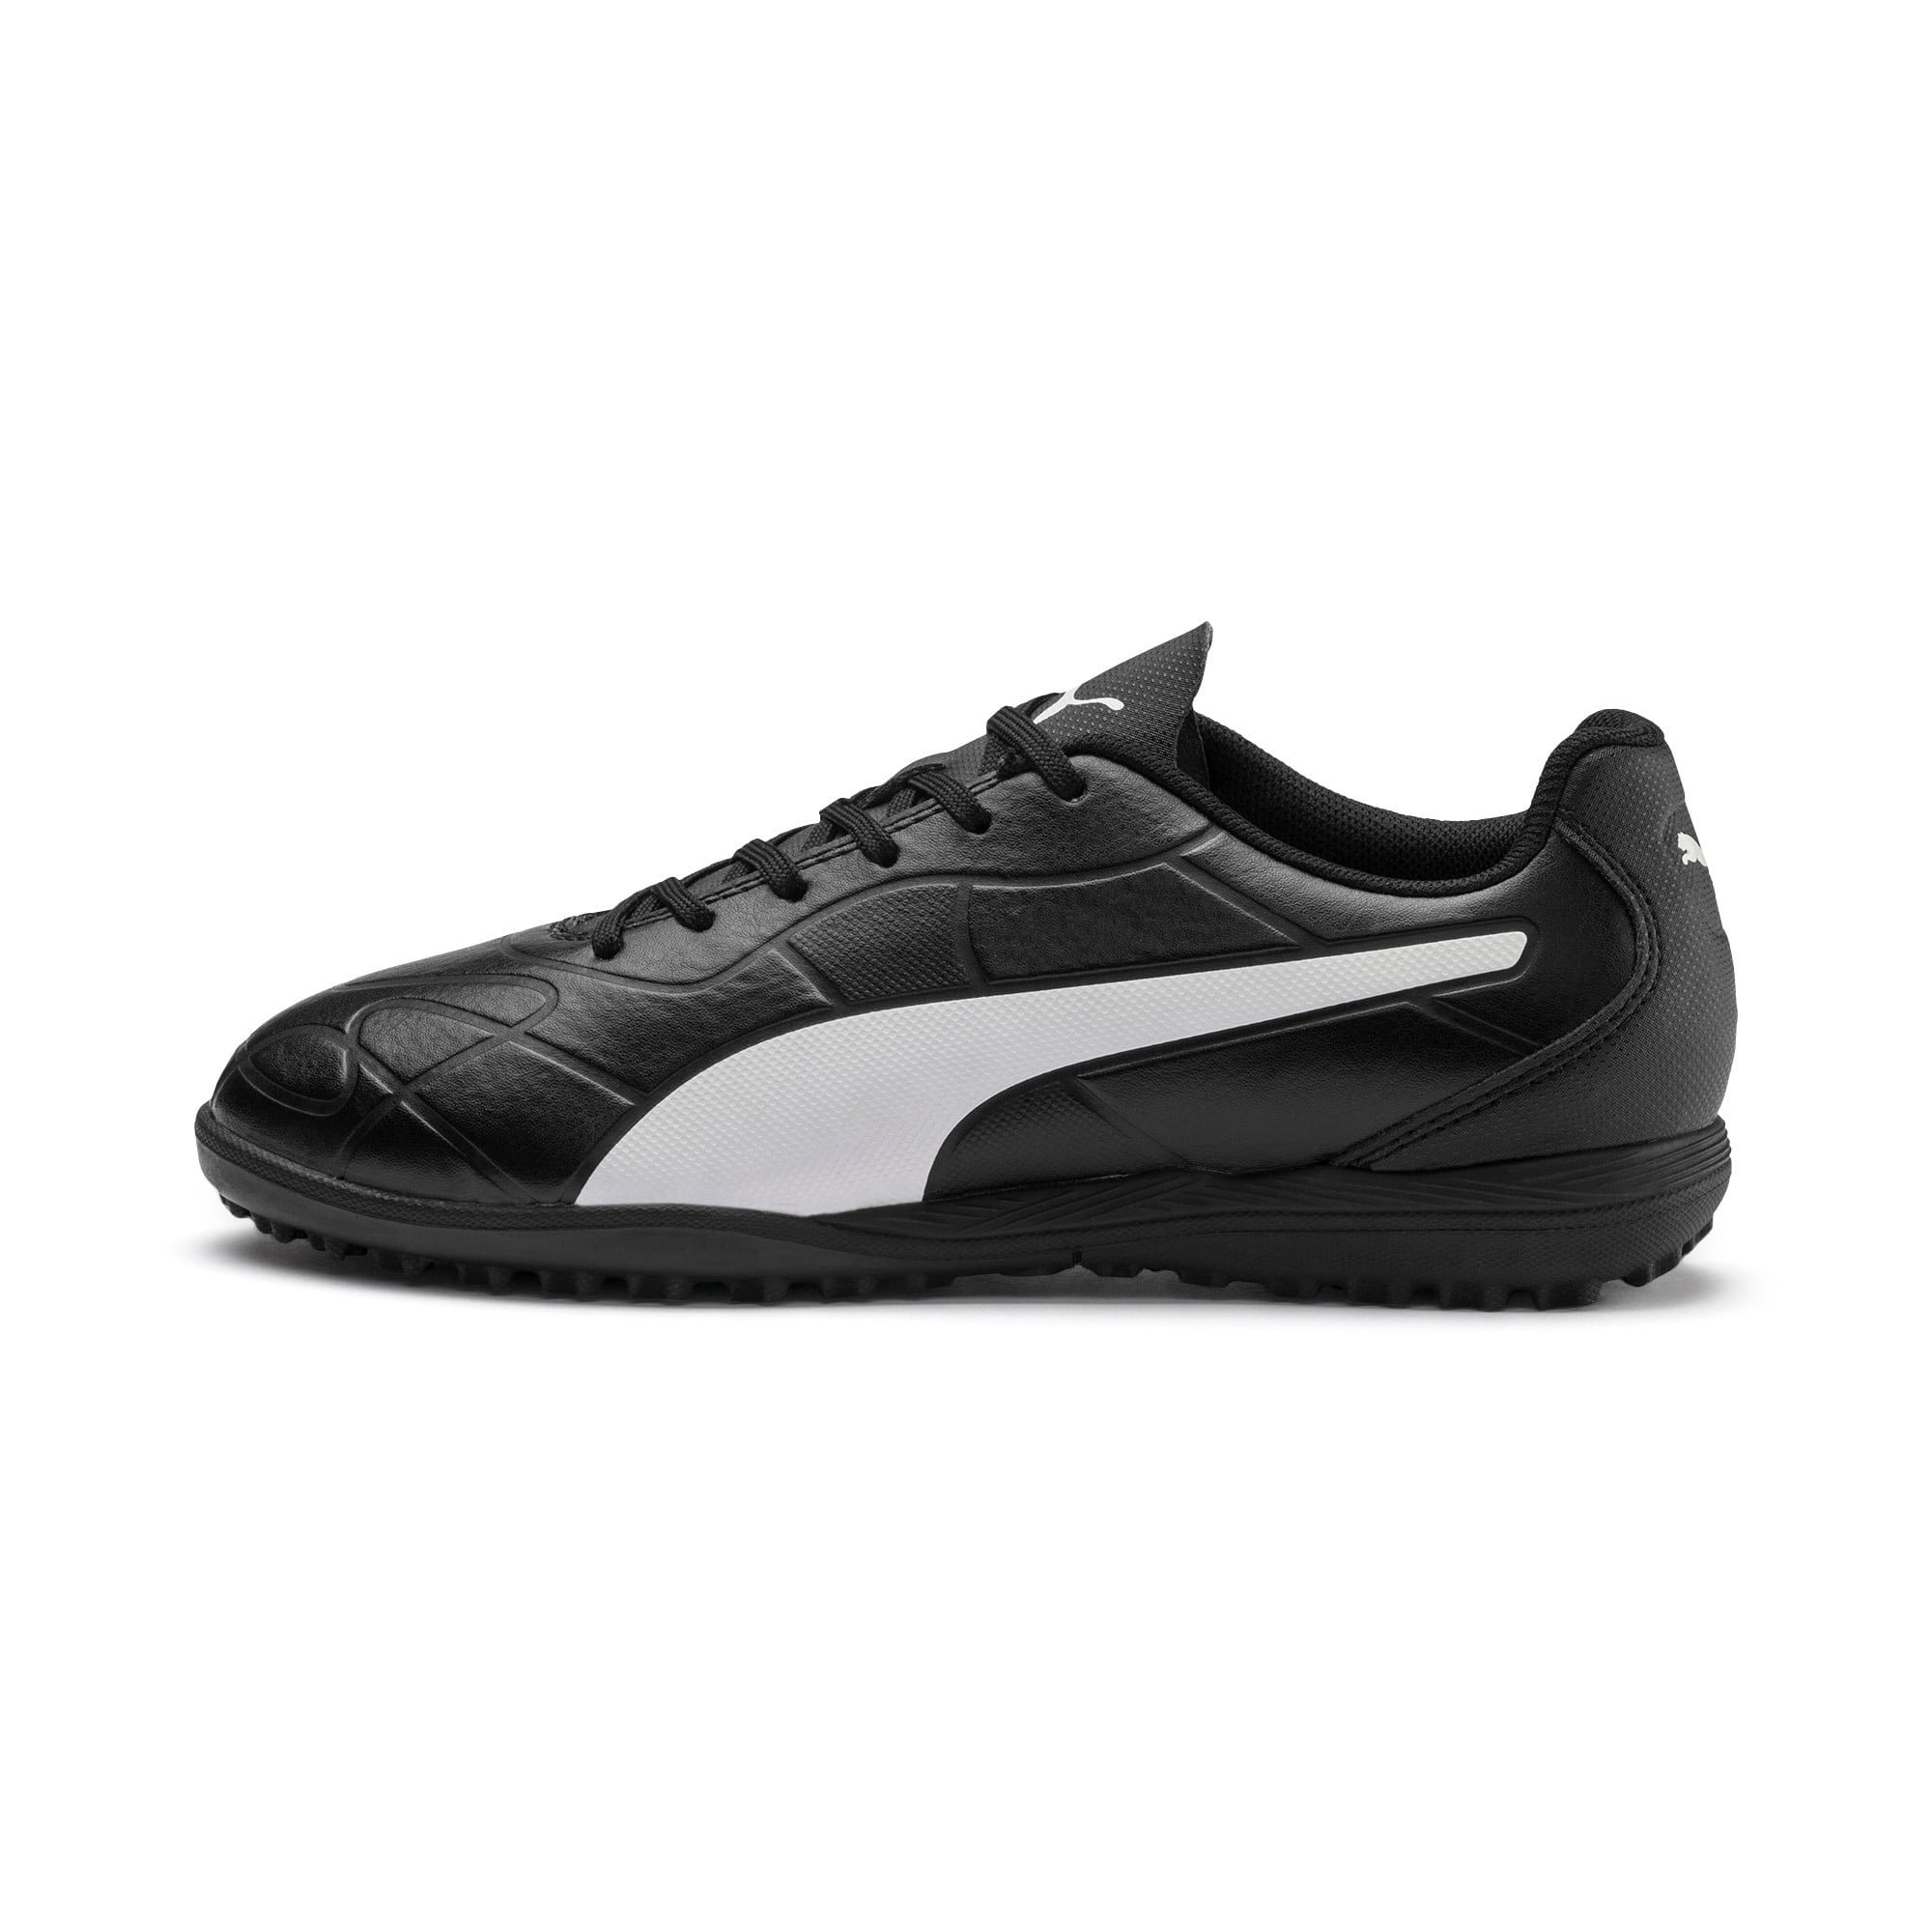 Thumbnail 1 of Monarch TT Youth Football Boots, Puma Black-Puma White, medium